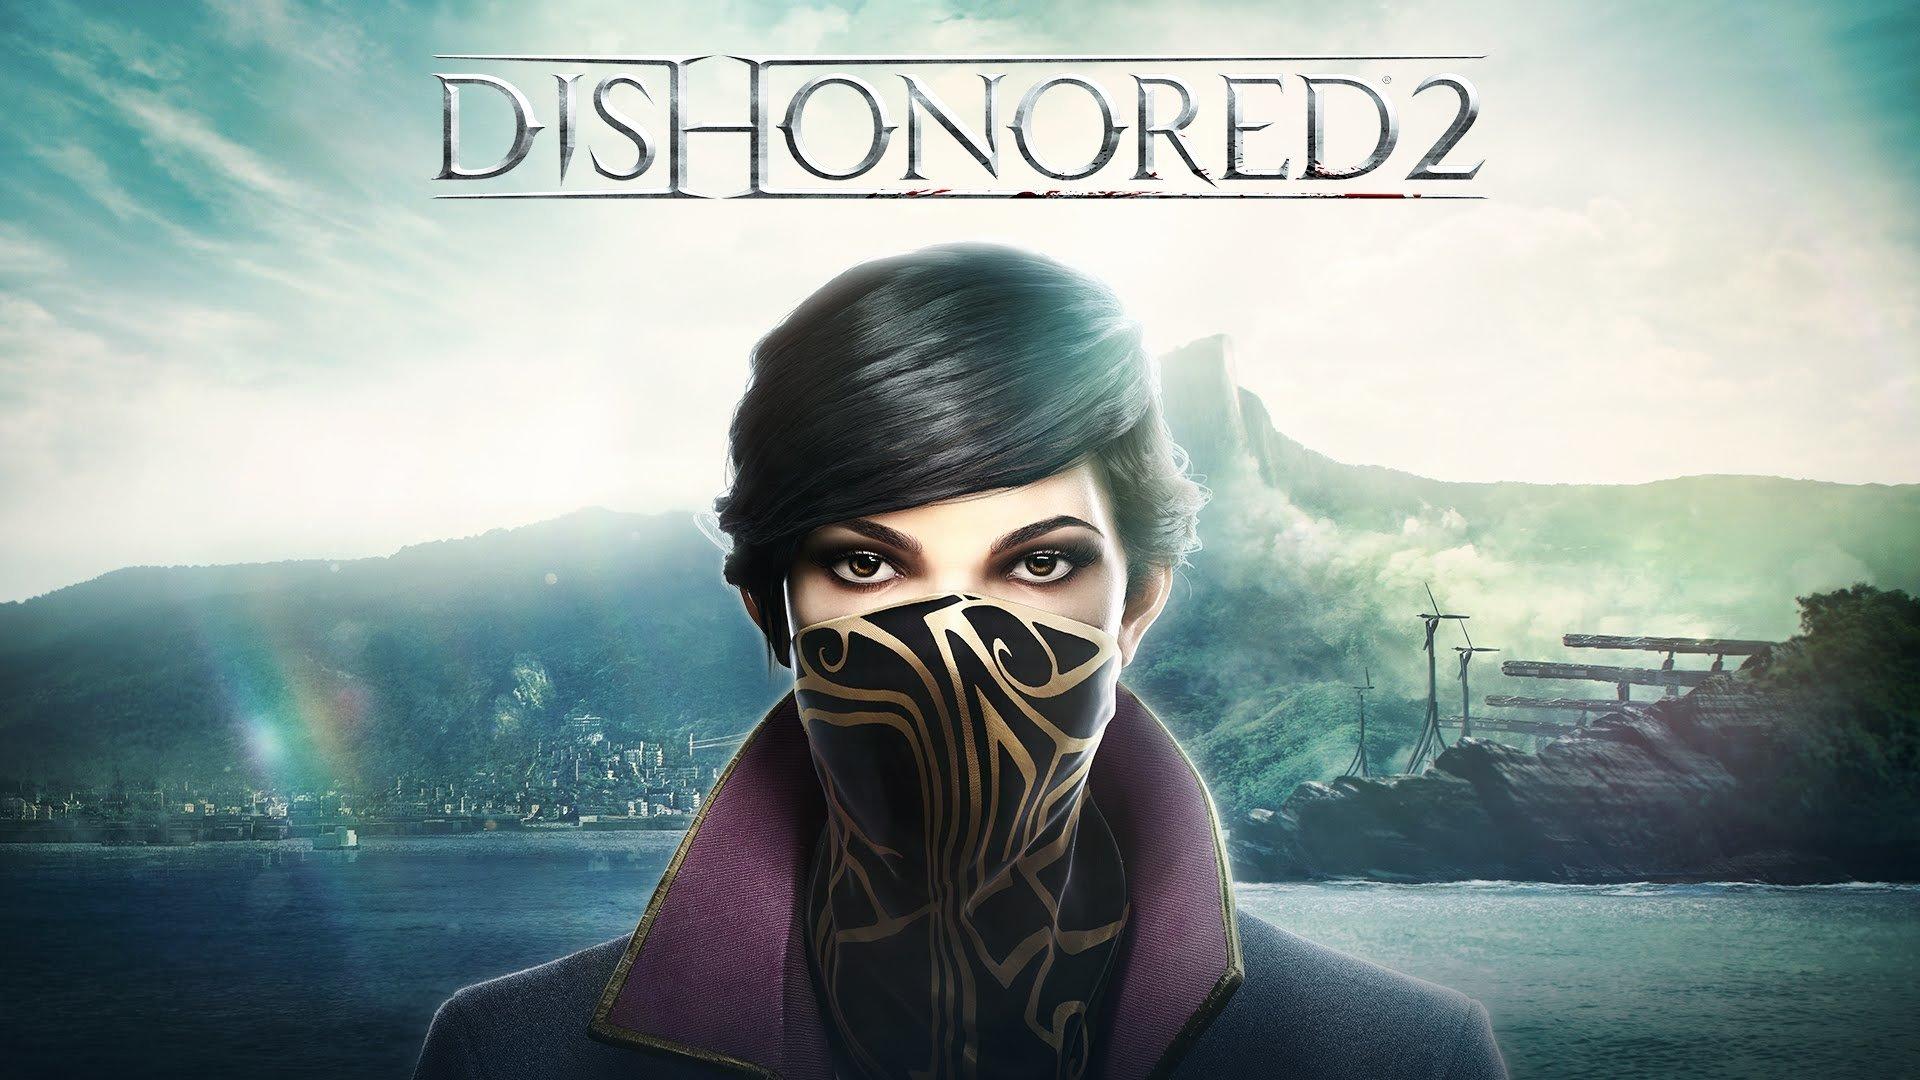 Dishonored 2 Fondo De Pantalla Hd Fondo De Escritorio